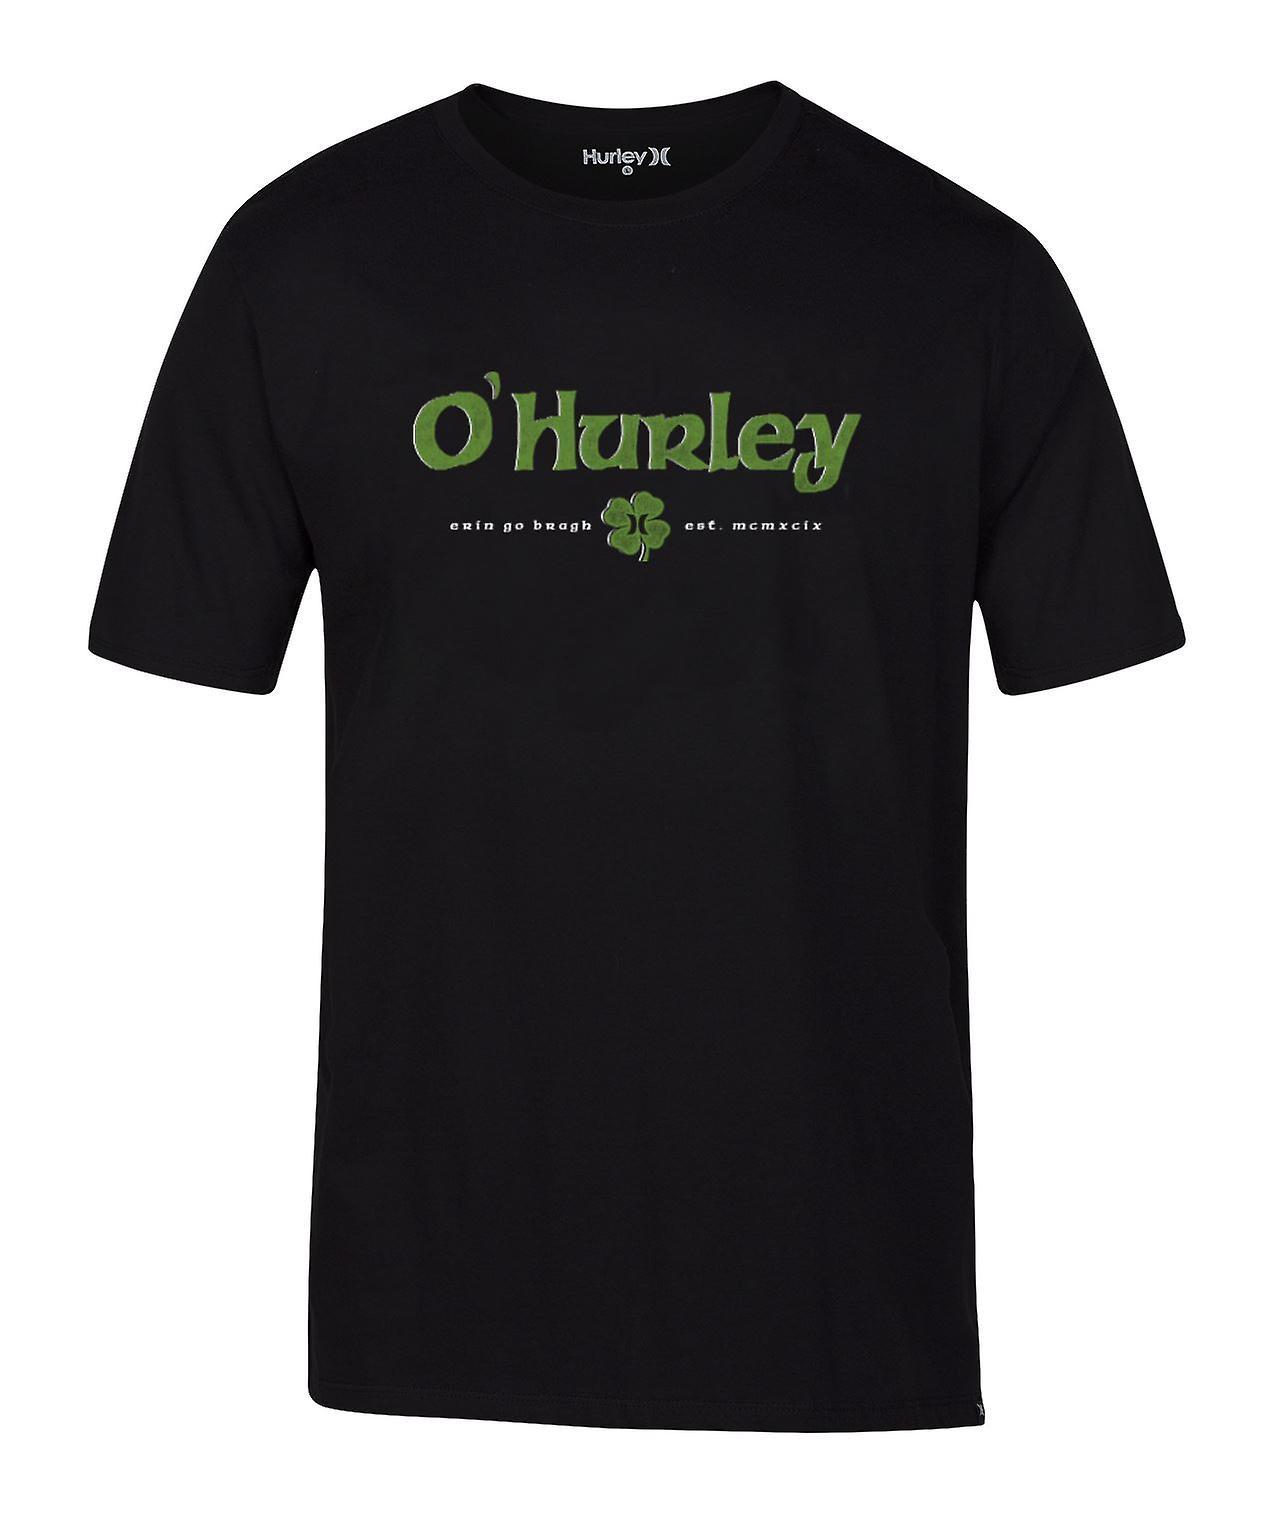 Hurley Men's T-Shirt ~ O'Hurley